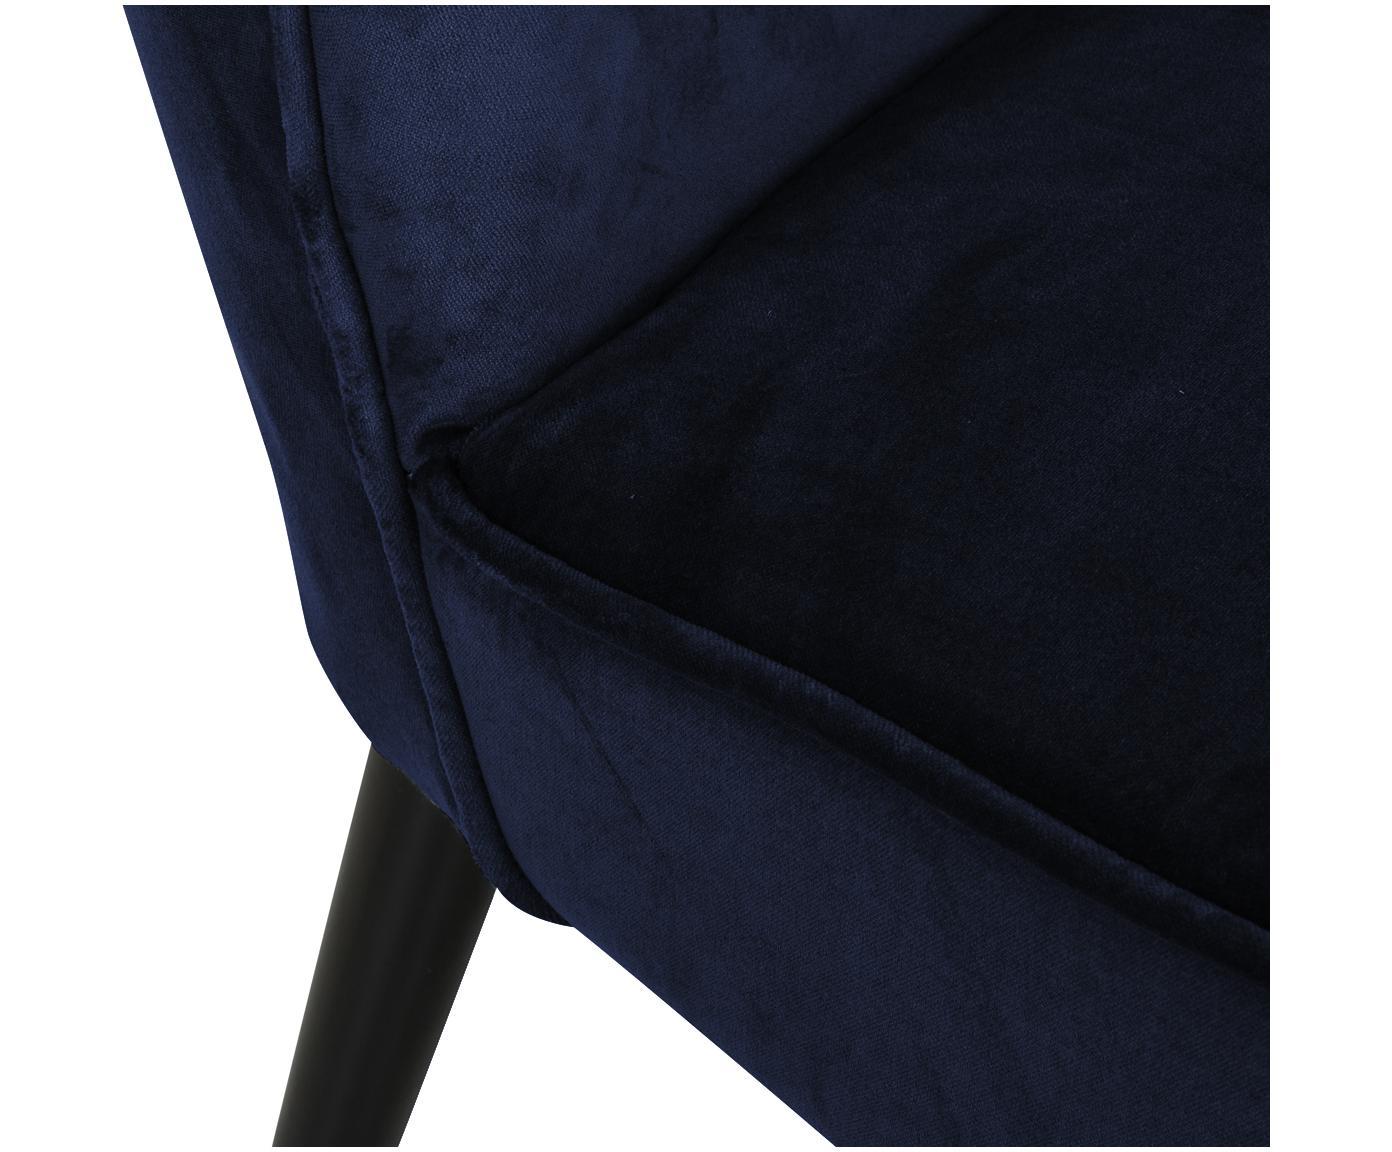 Fluwelen fauteuil Robine, Bekleding: fluweel (polyester), Poten: berkenhout, Bekleding: marineblauw, Poten: zwart, 63 x 75 cm